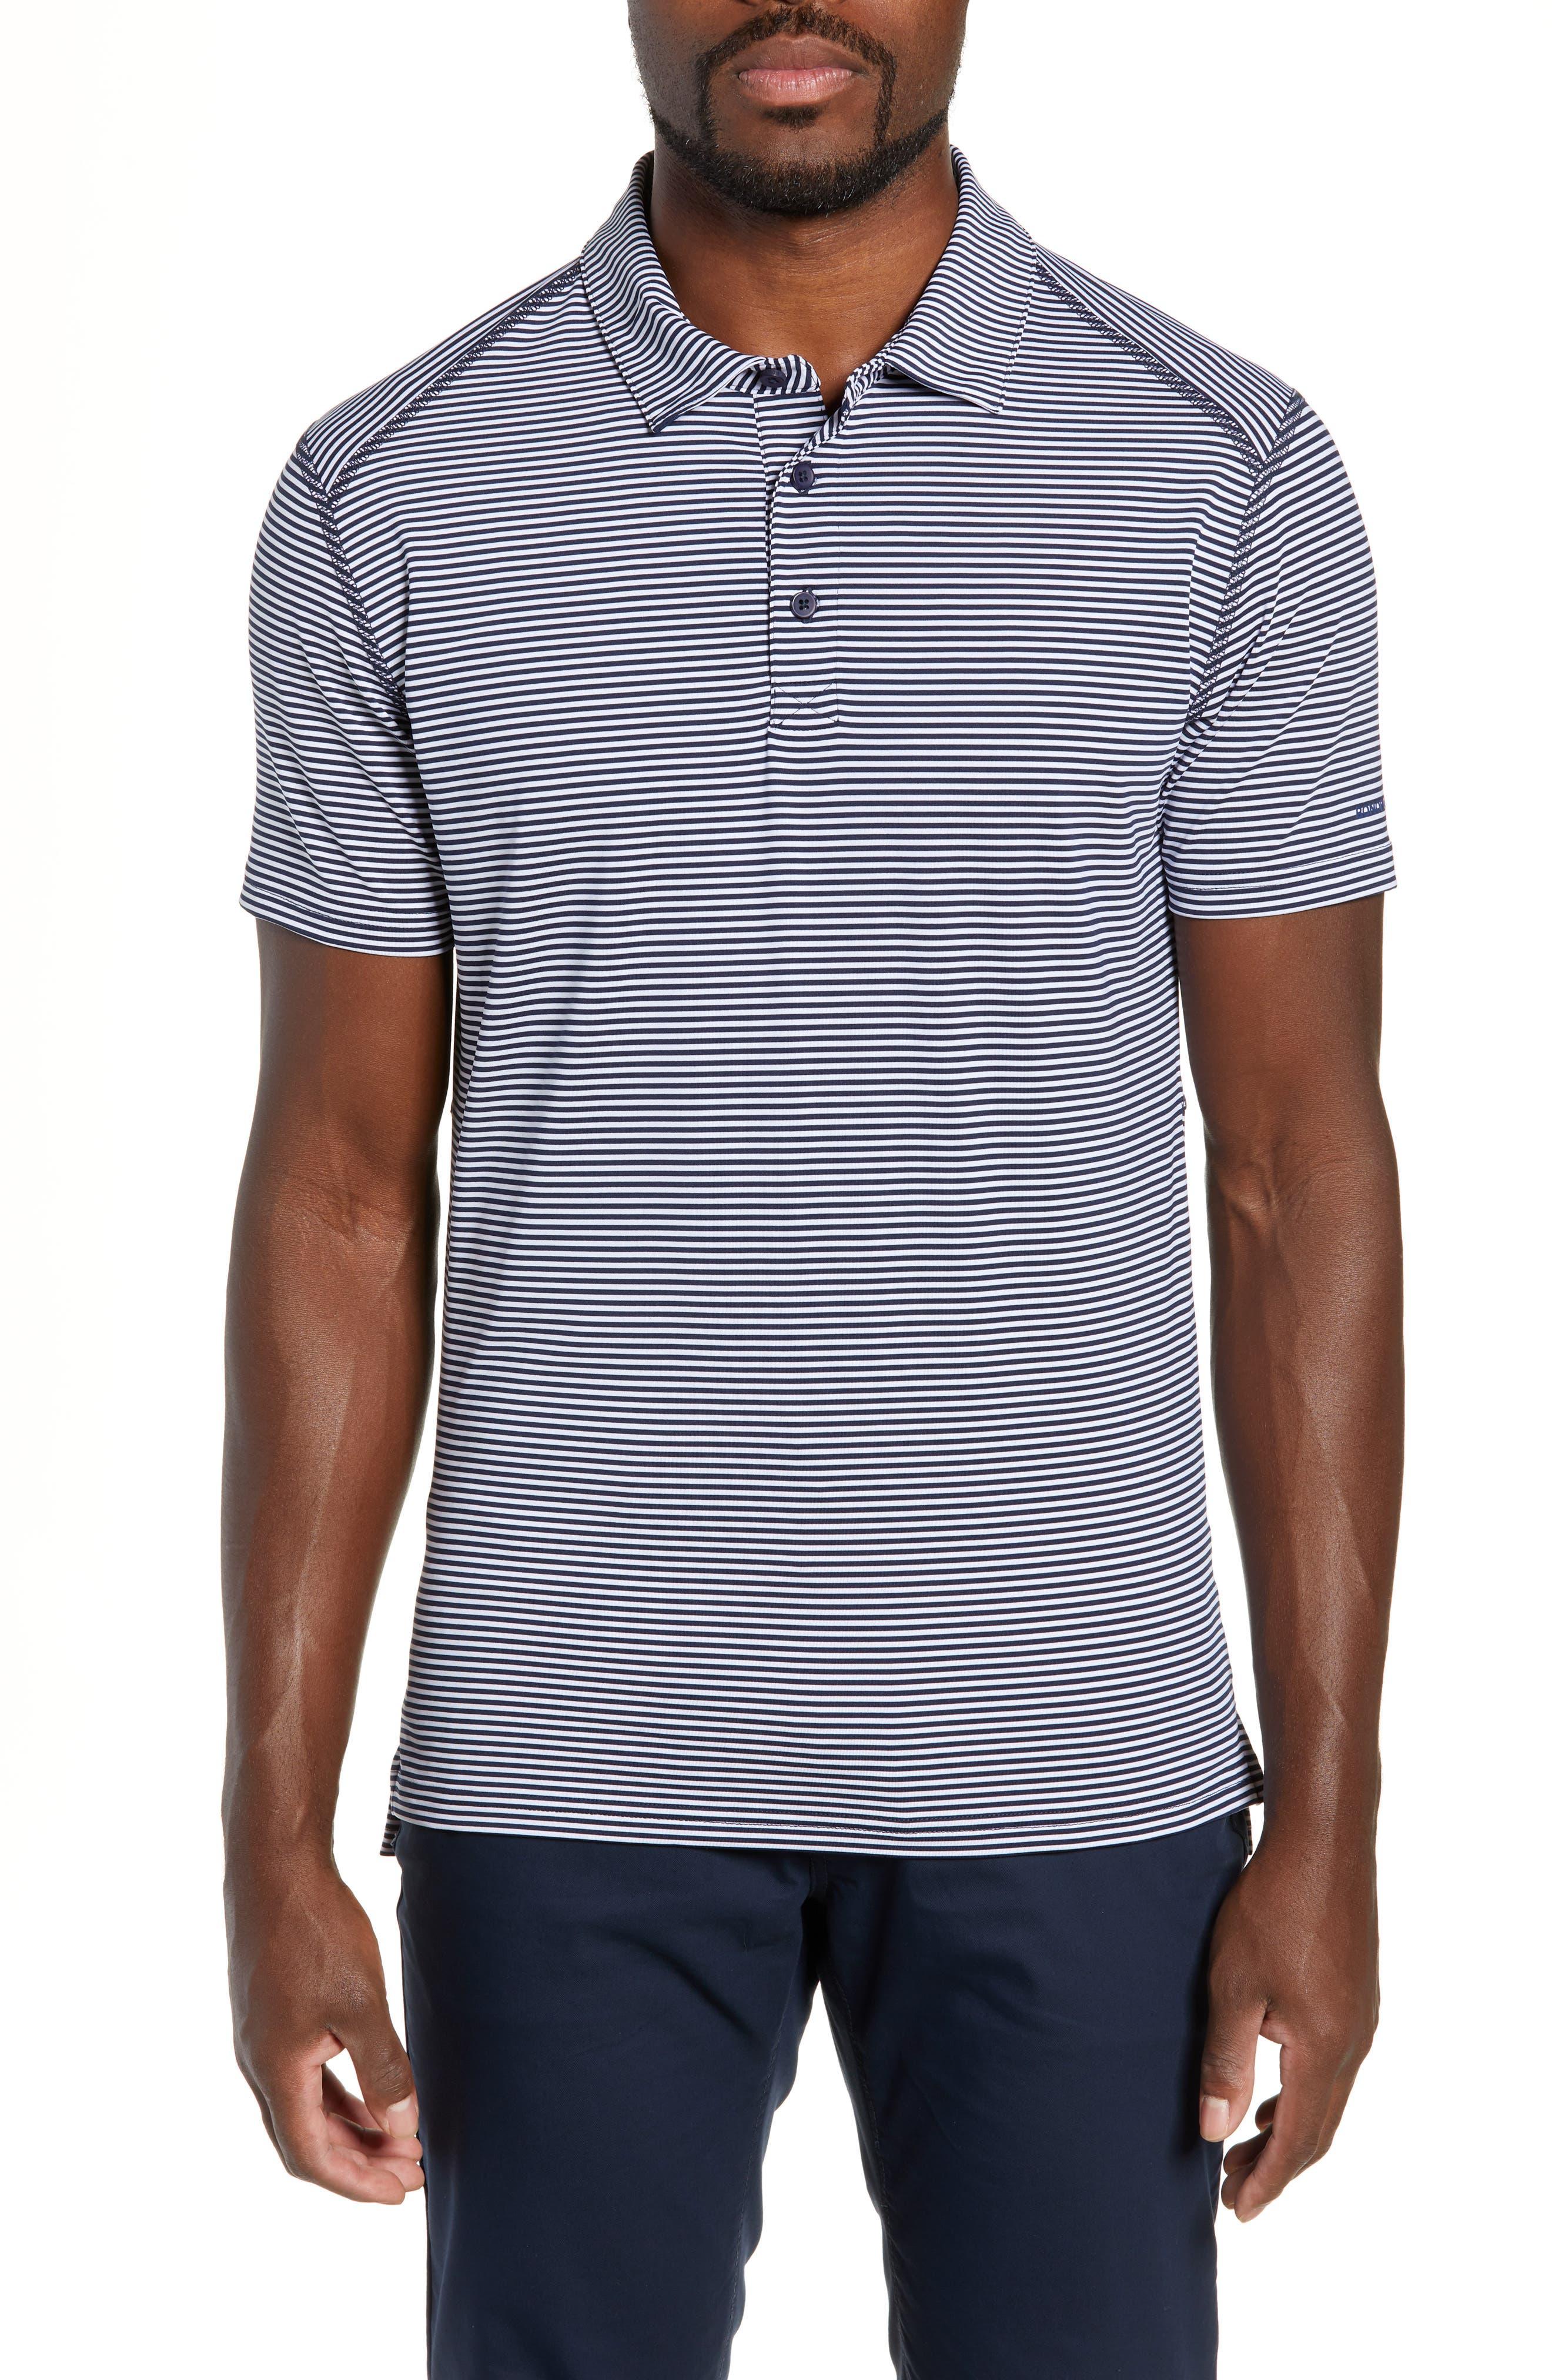 Flatiron Slim Fit Jacquard Jersey Polo,                         Main,                         color, NAVY/ WHITE